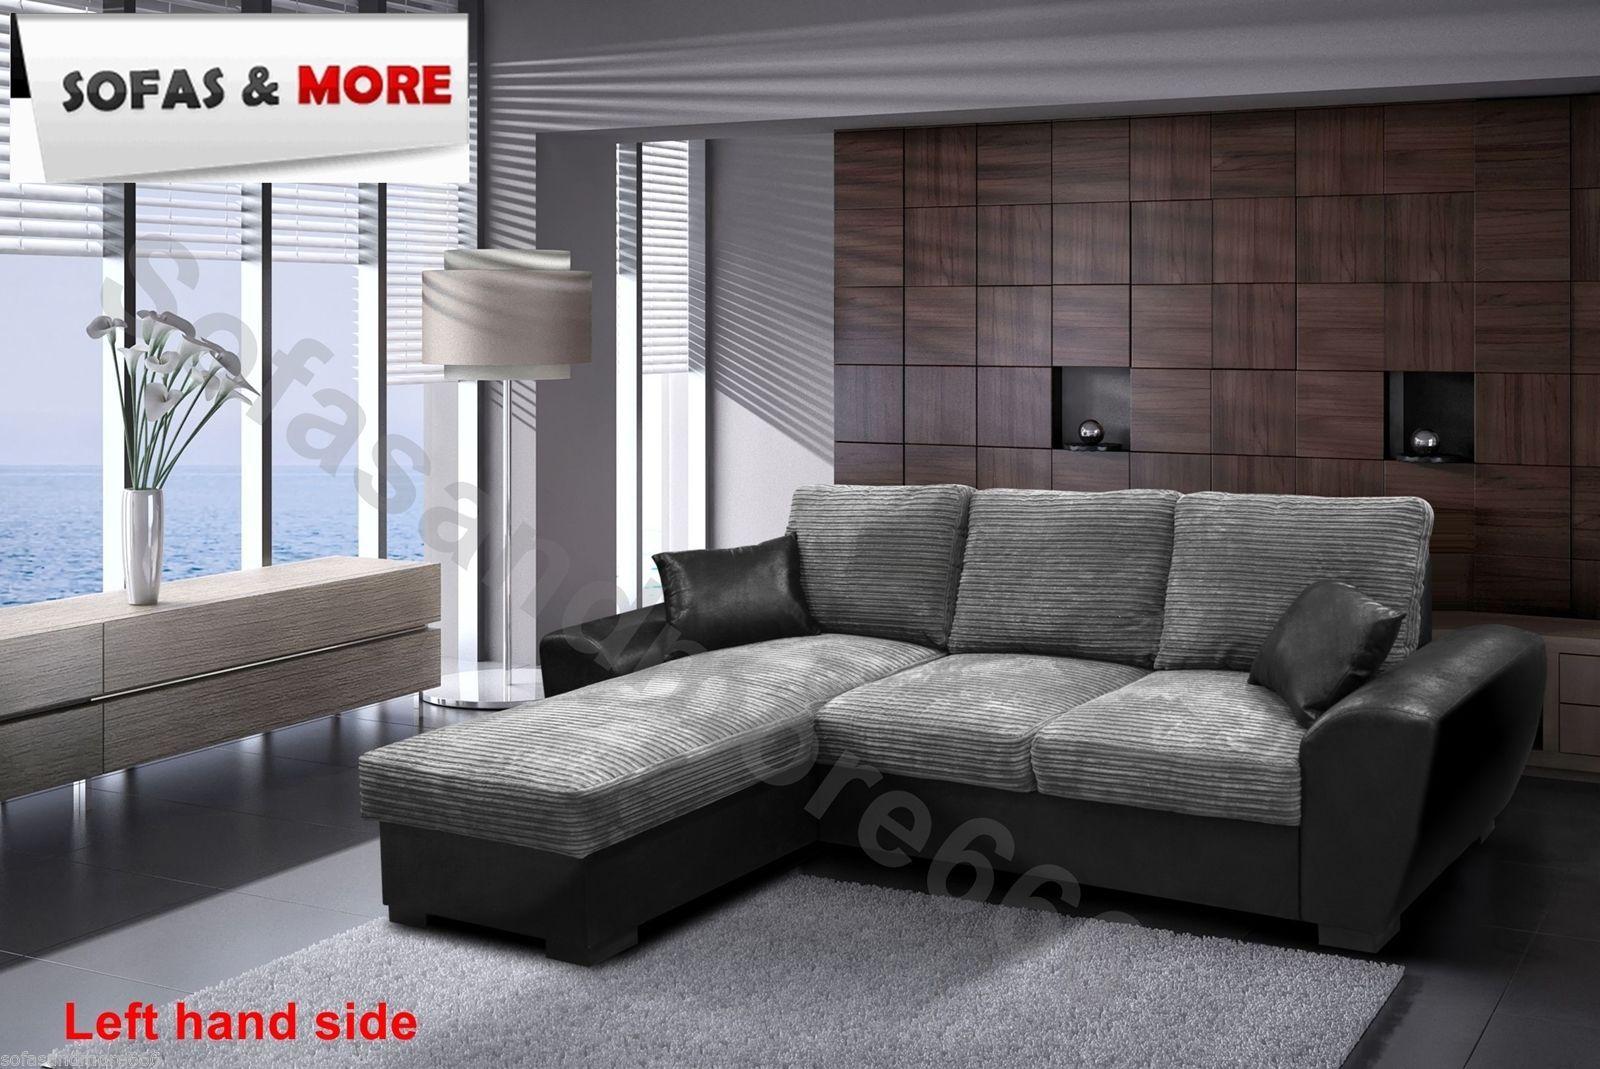 http://www.ebay.co.uk/itm/new-gianni-corner-sofa-bed-grey-brown